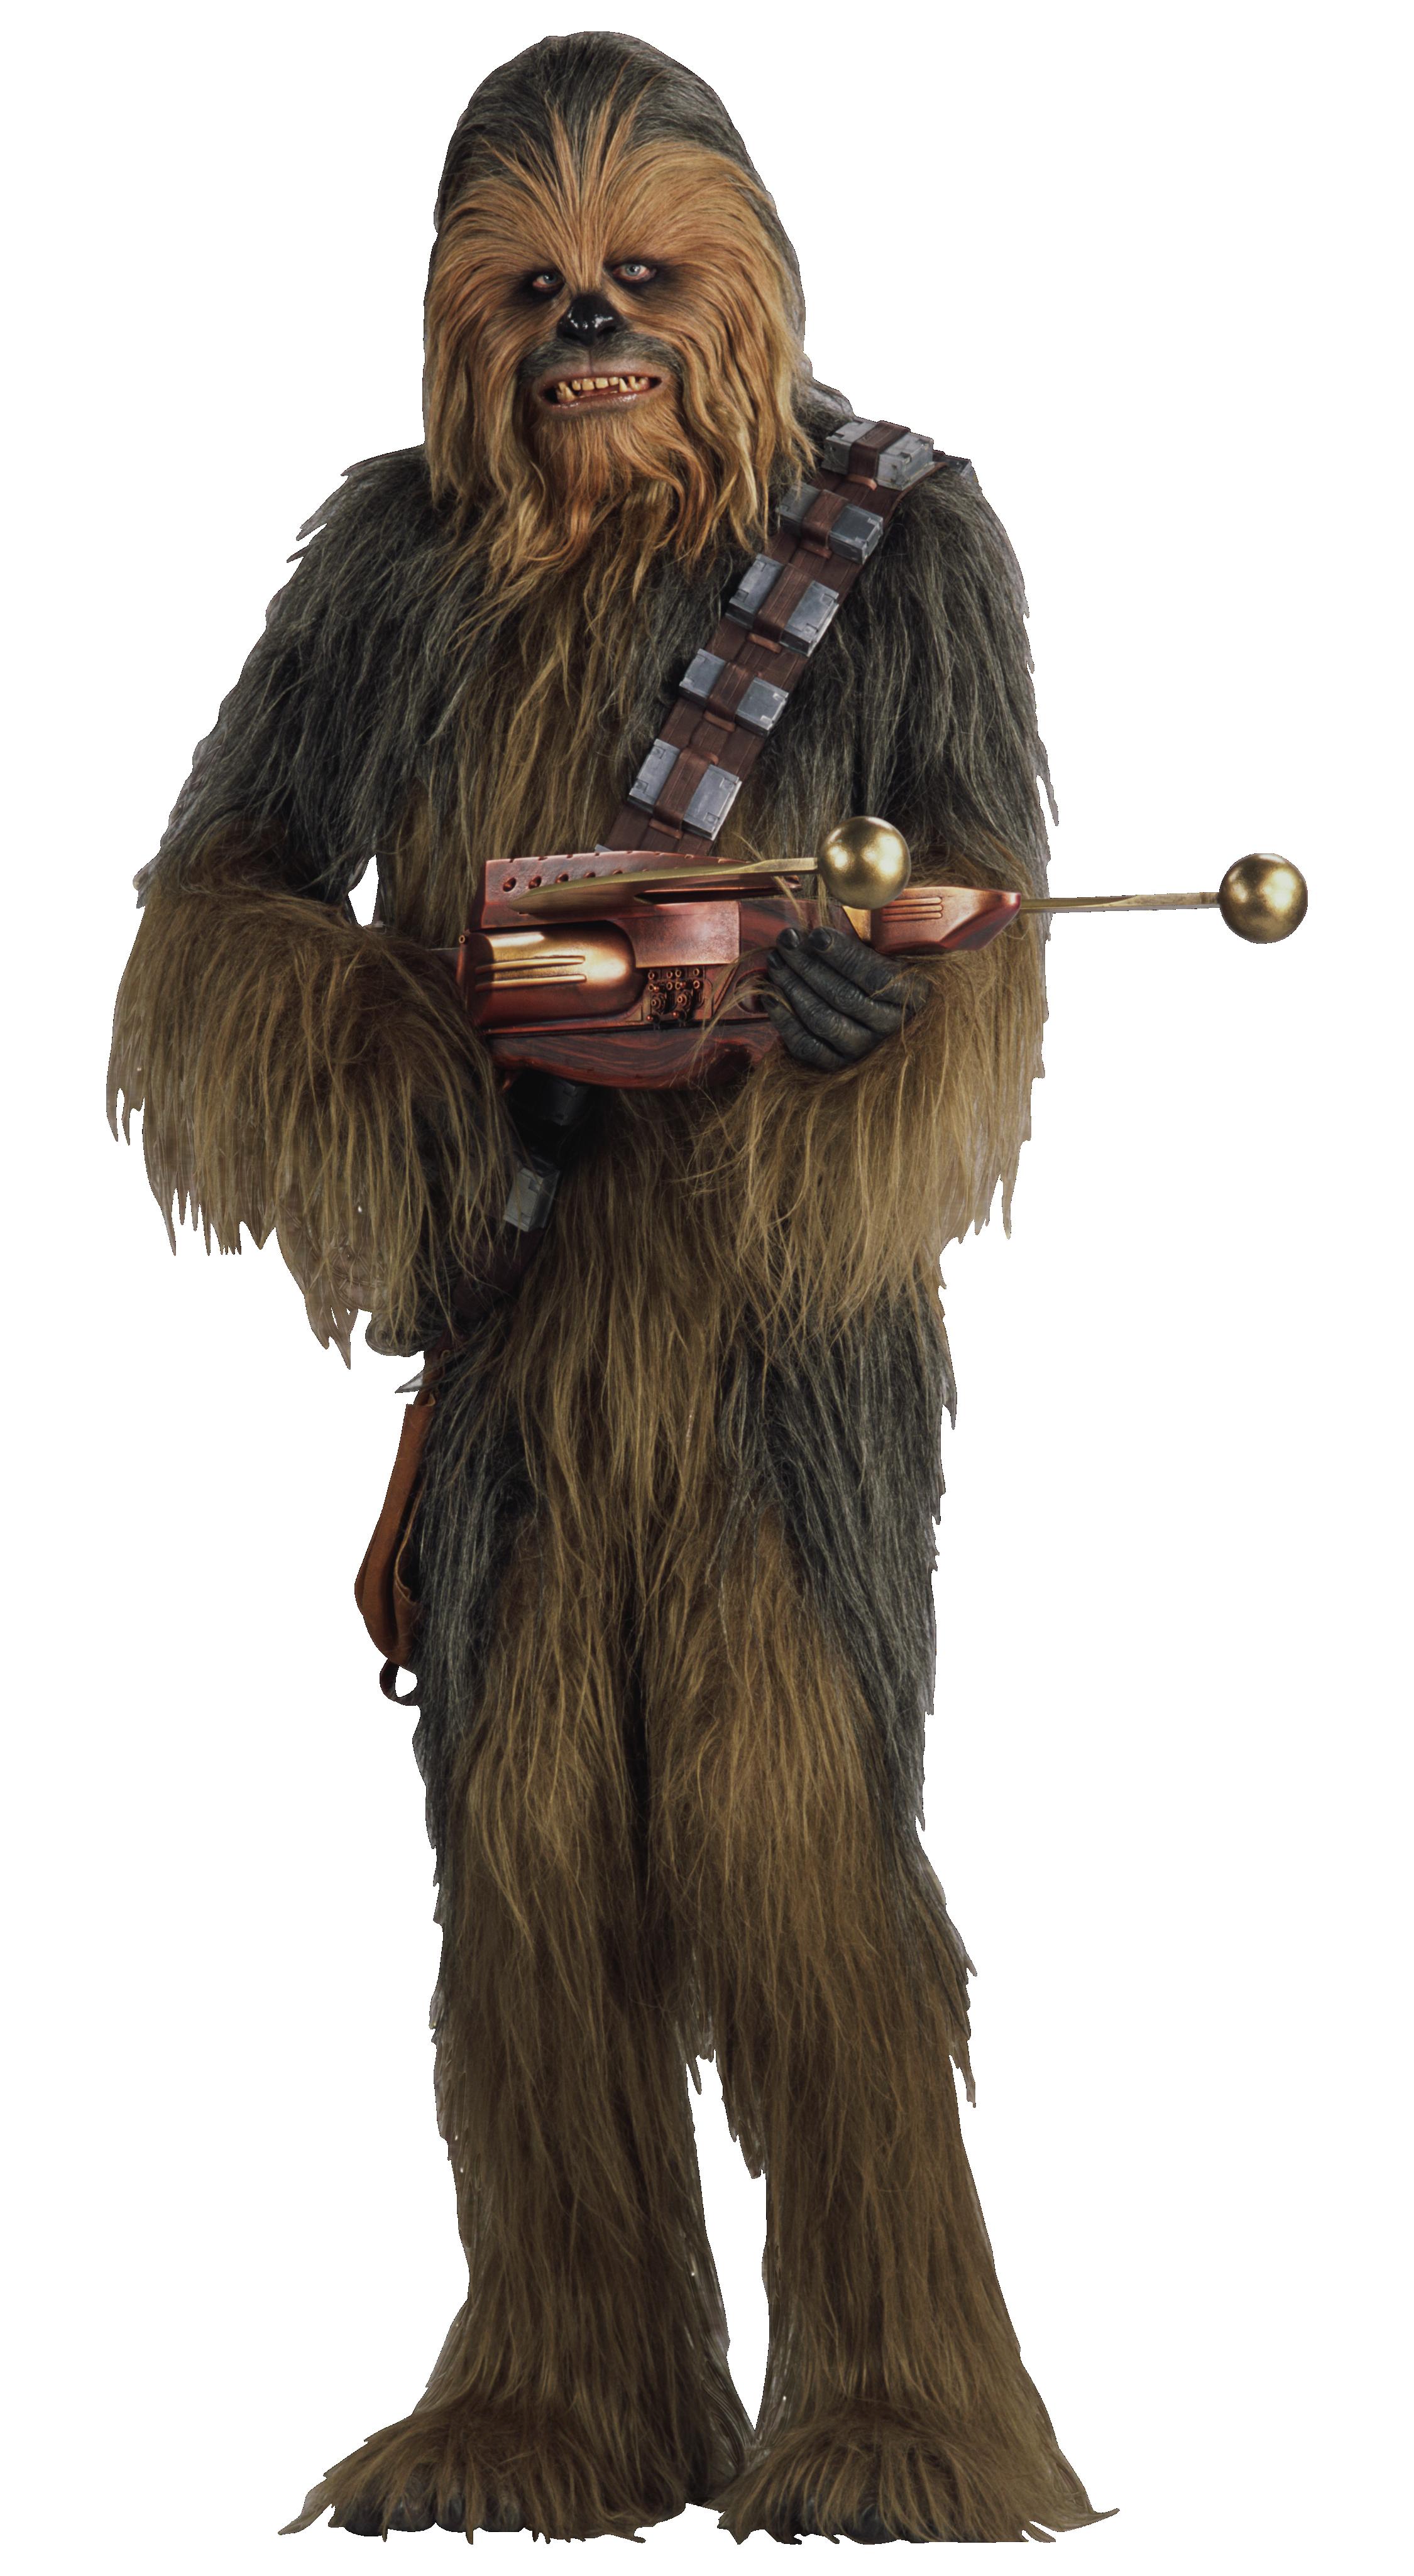 Barabel   Wookieepedia   Fandom powered by Wikia